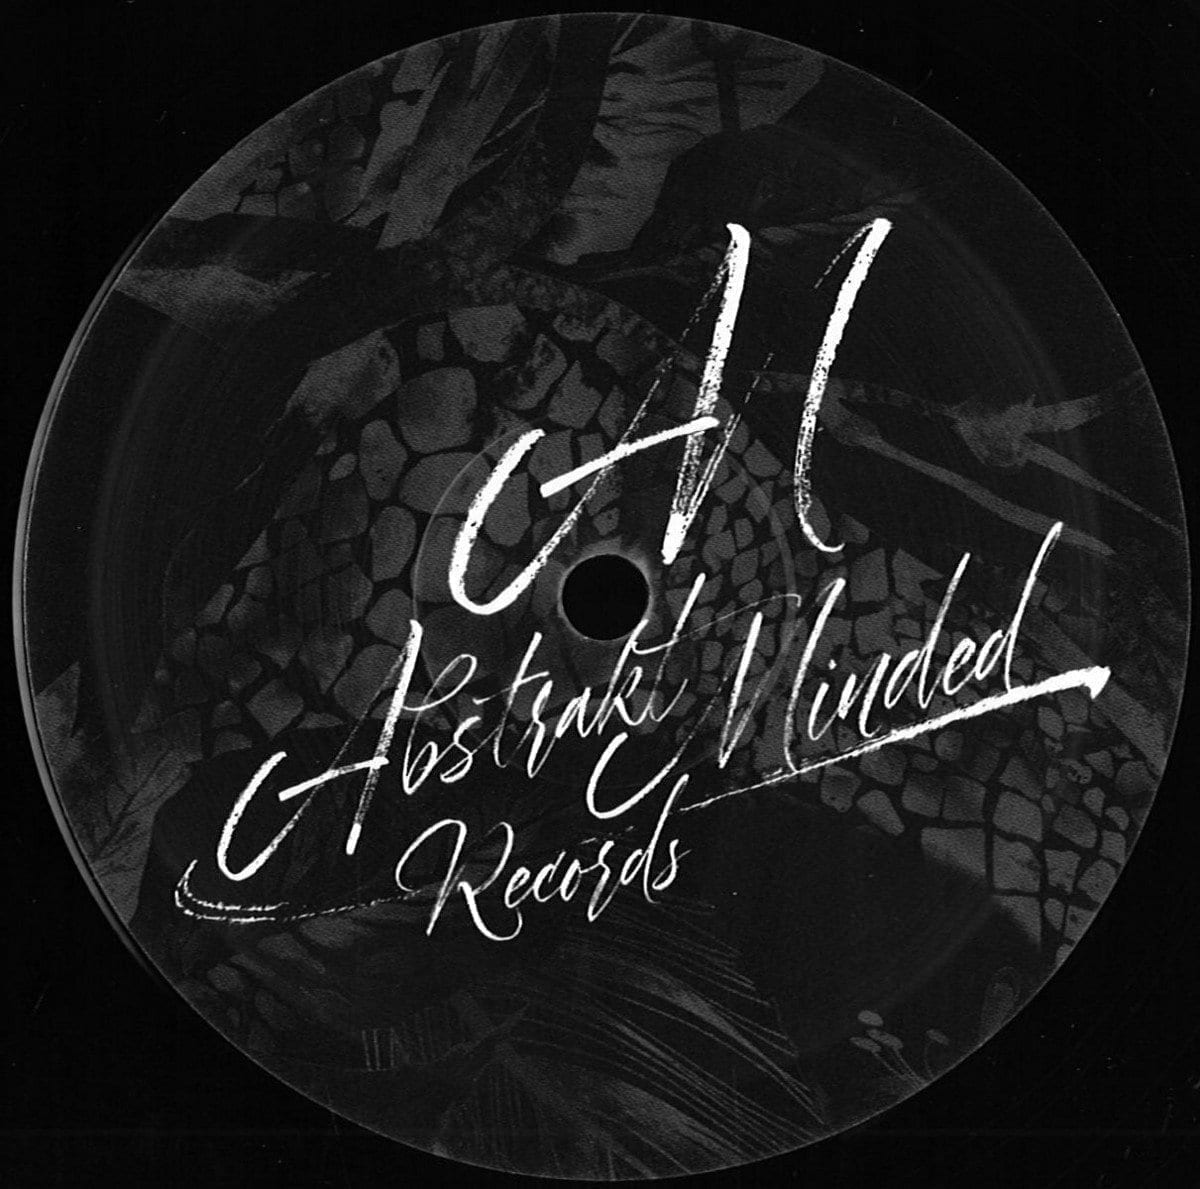 Friedrich Becker / Sabèr / Herck - Friber EP on Abstrakt Minded Records